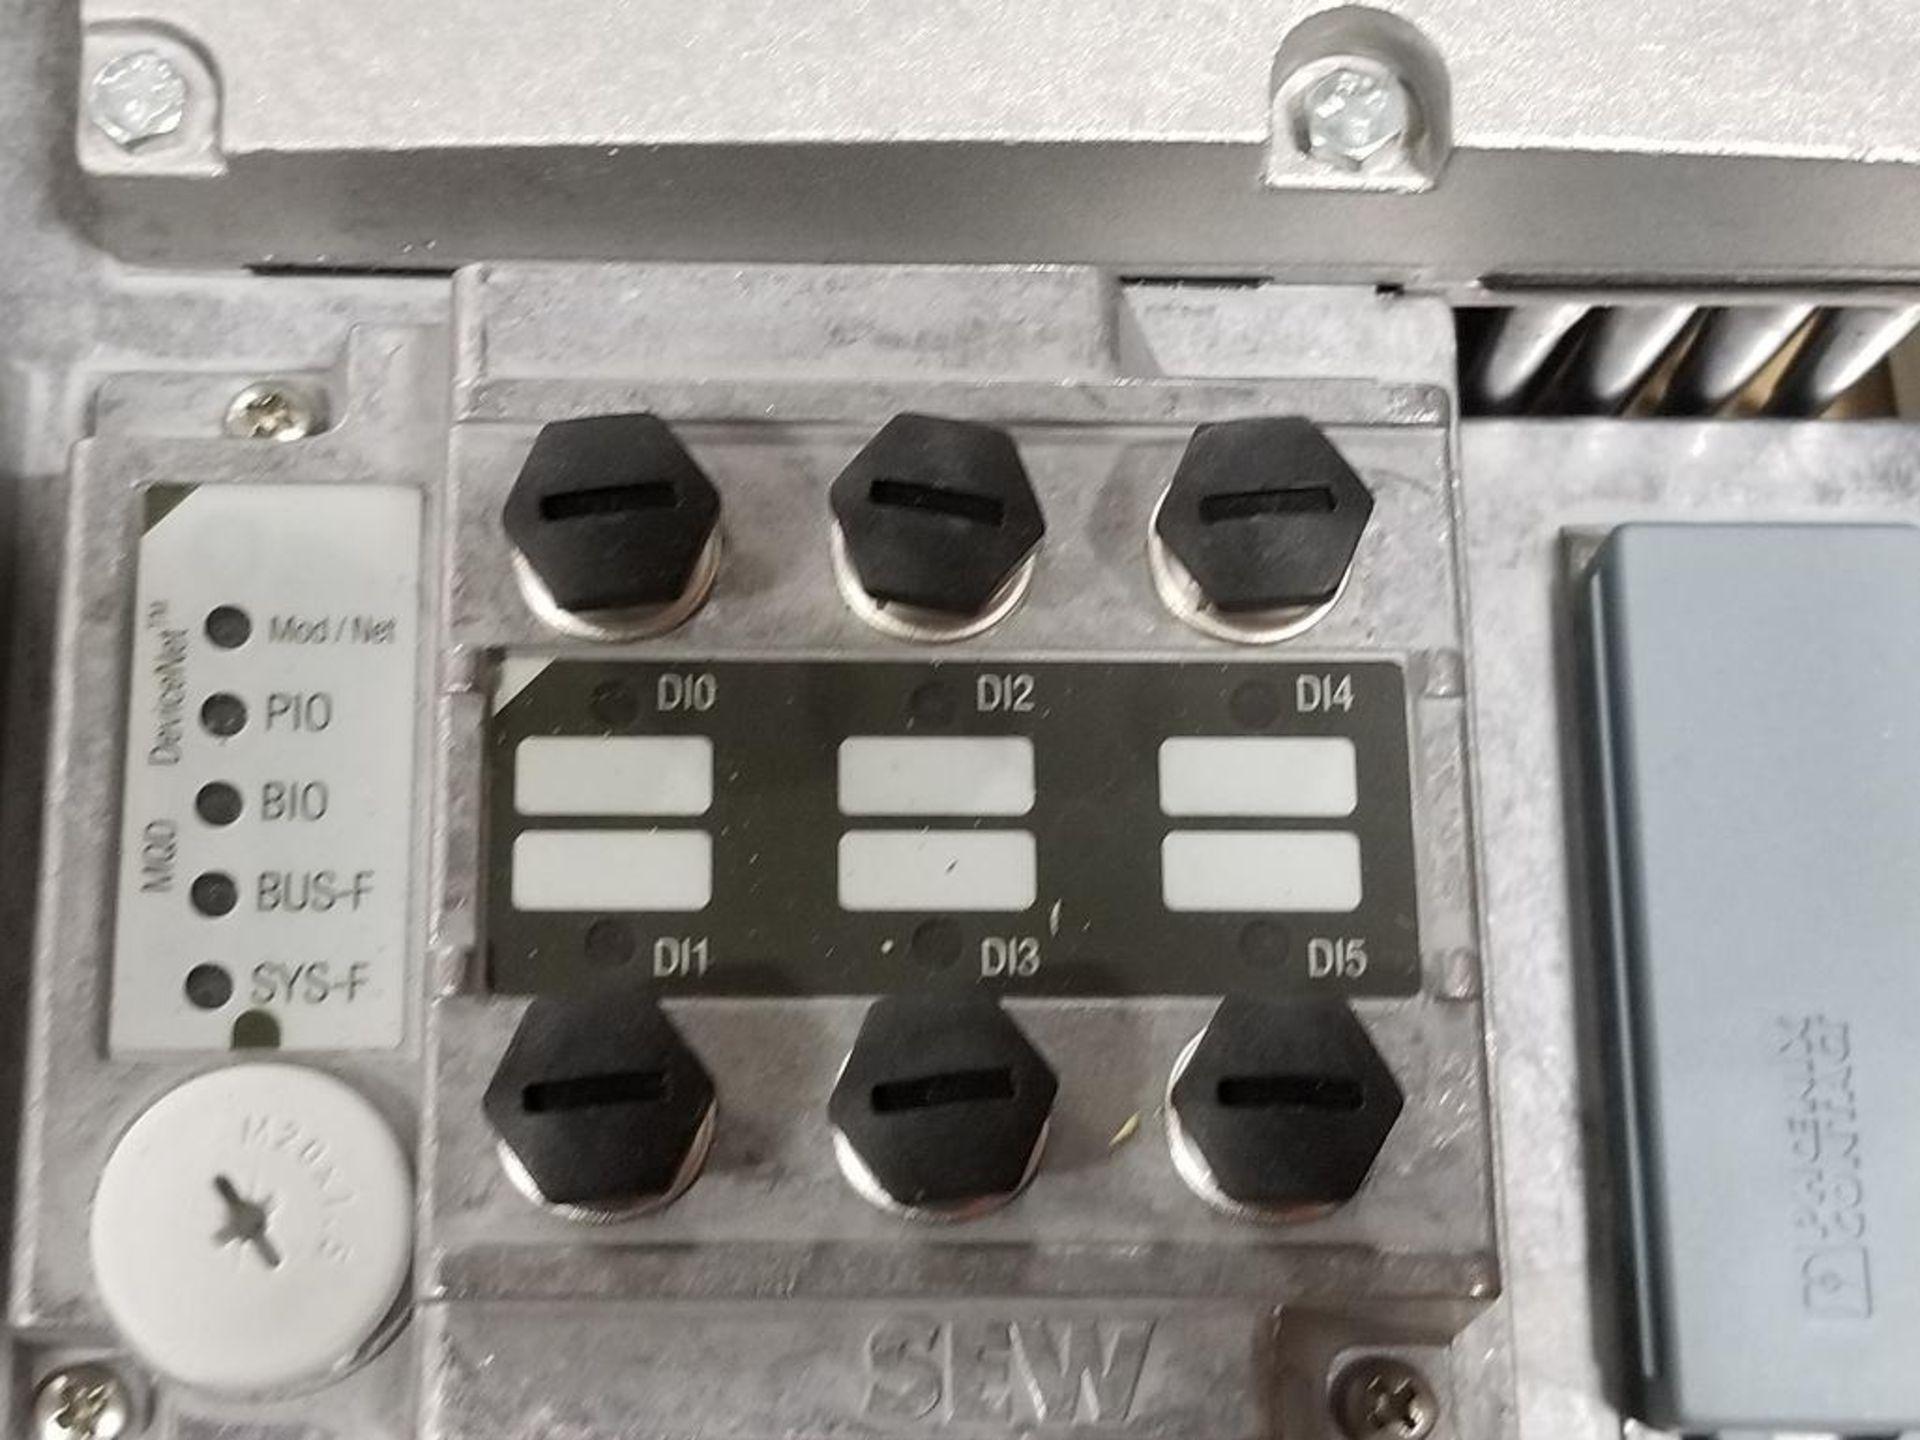 SEW Eurodrive MQD32A/MM03C-503-00/Z238G 0-AGB Drive. - Image 4 of 7